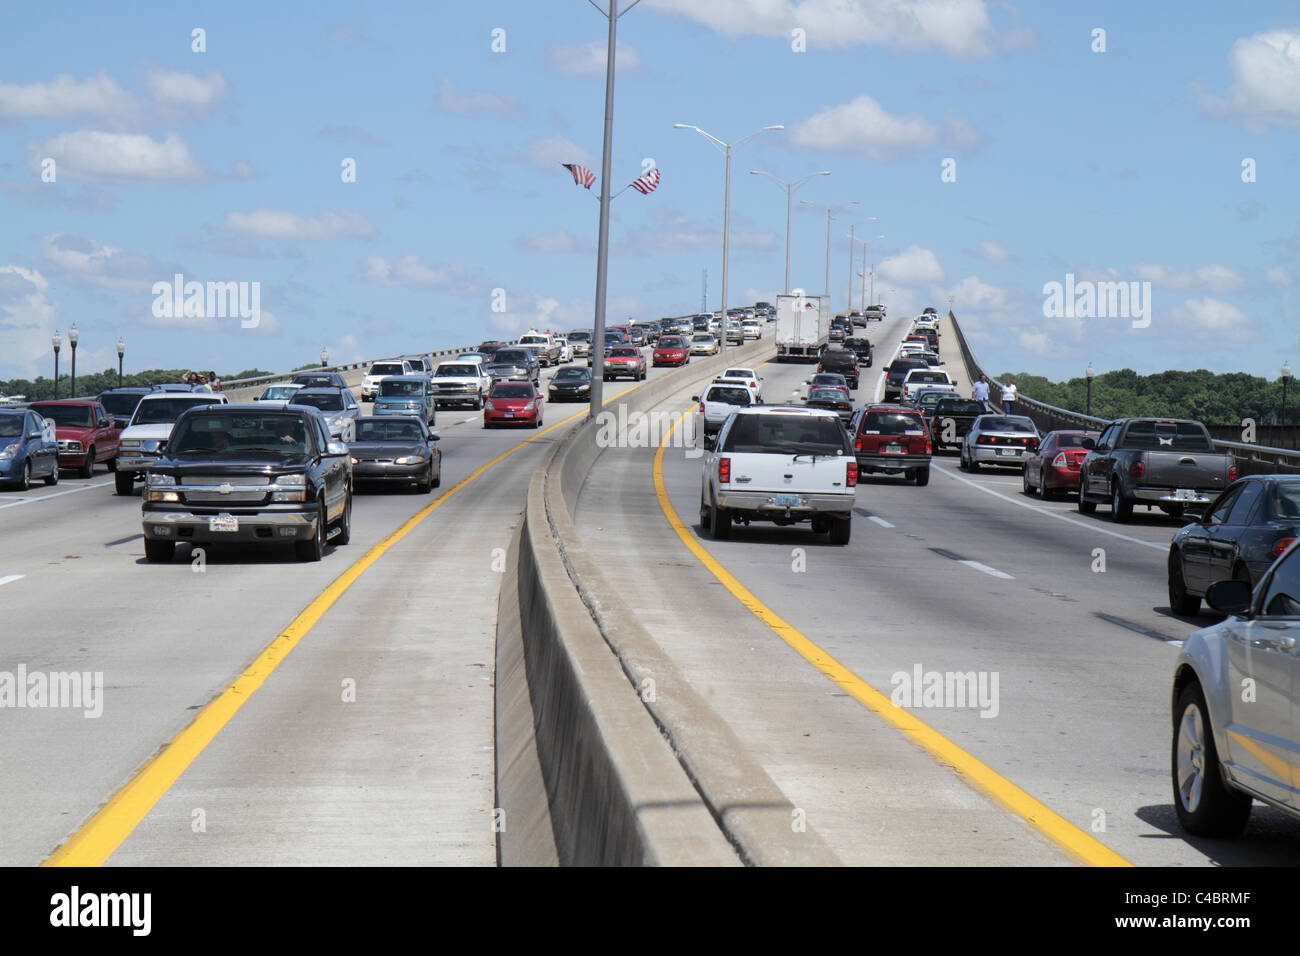 Florida Palatka St. John's River Bridge illegally parked vehicles cars traffic - Stock Image